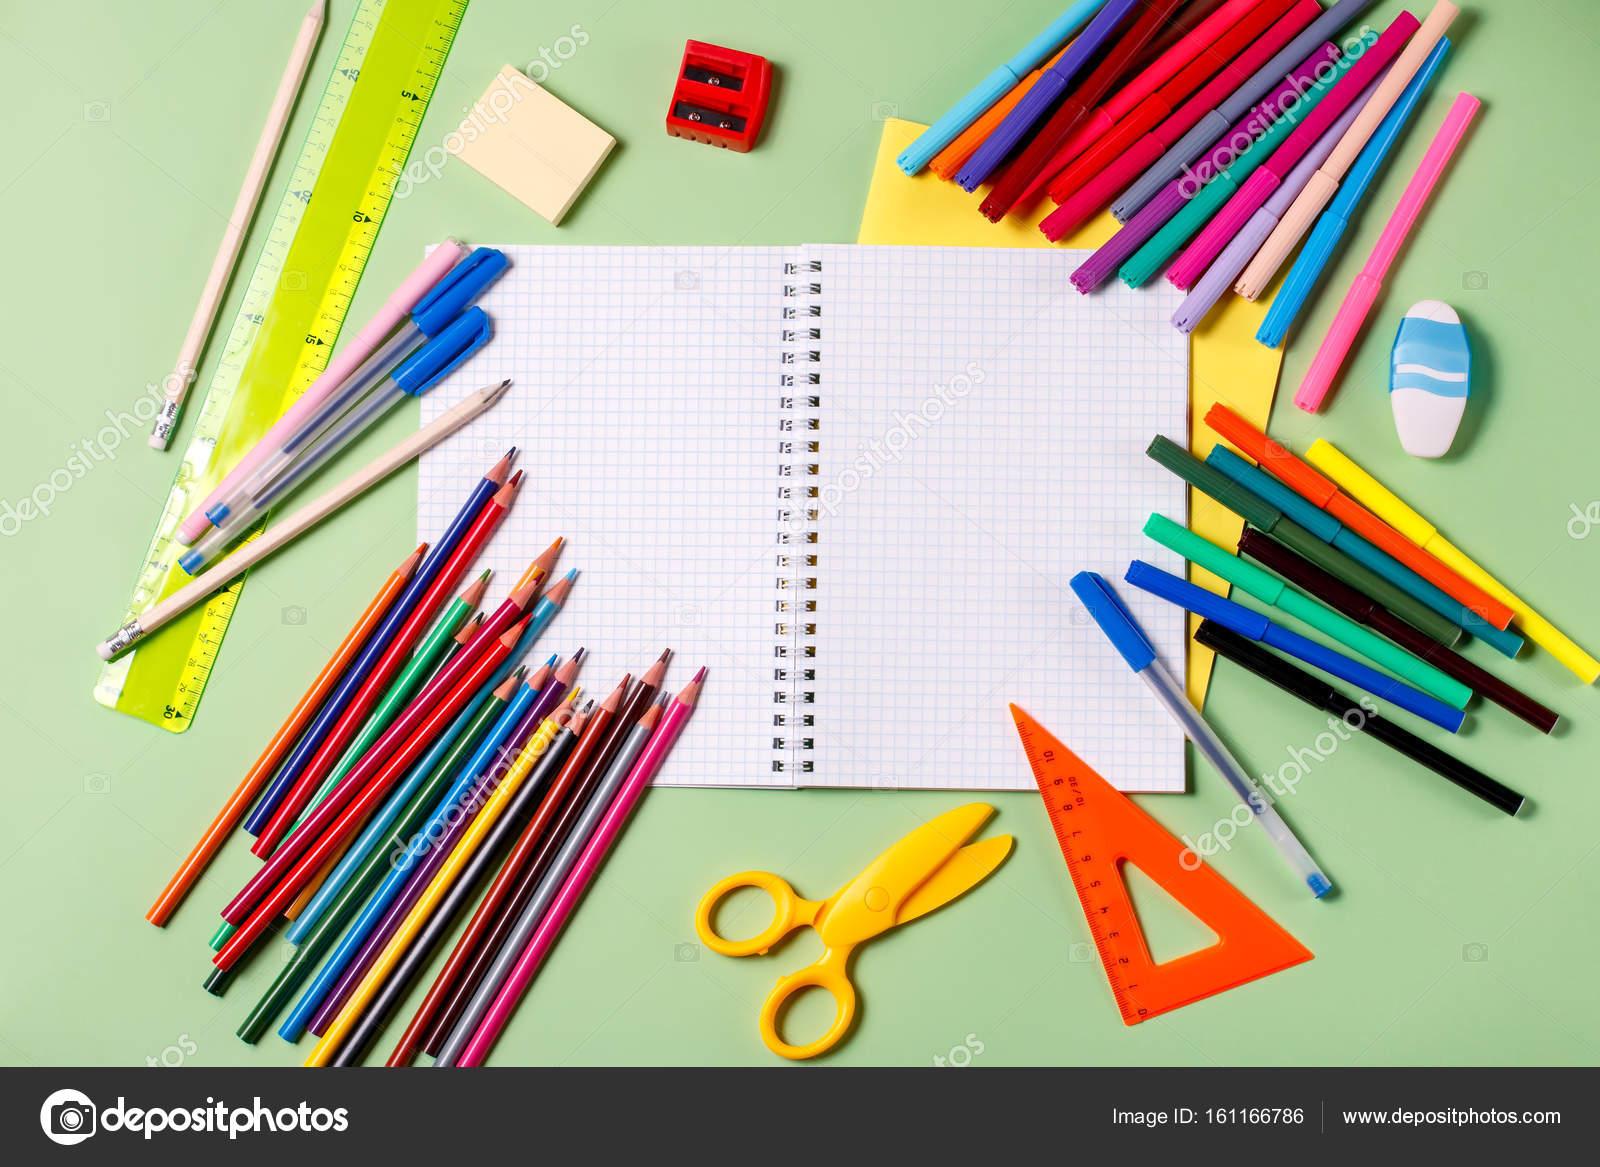 8507eb3915f Πίσω στο σχολείο έννοια. Σχολικά είδη σε παστέλ φόντο — Φωτογραφία Αρχείου